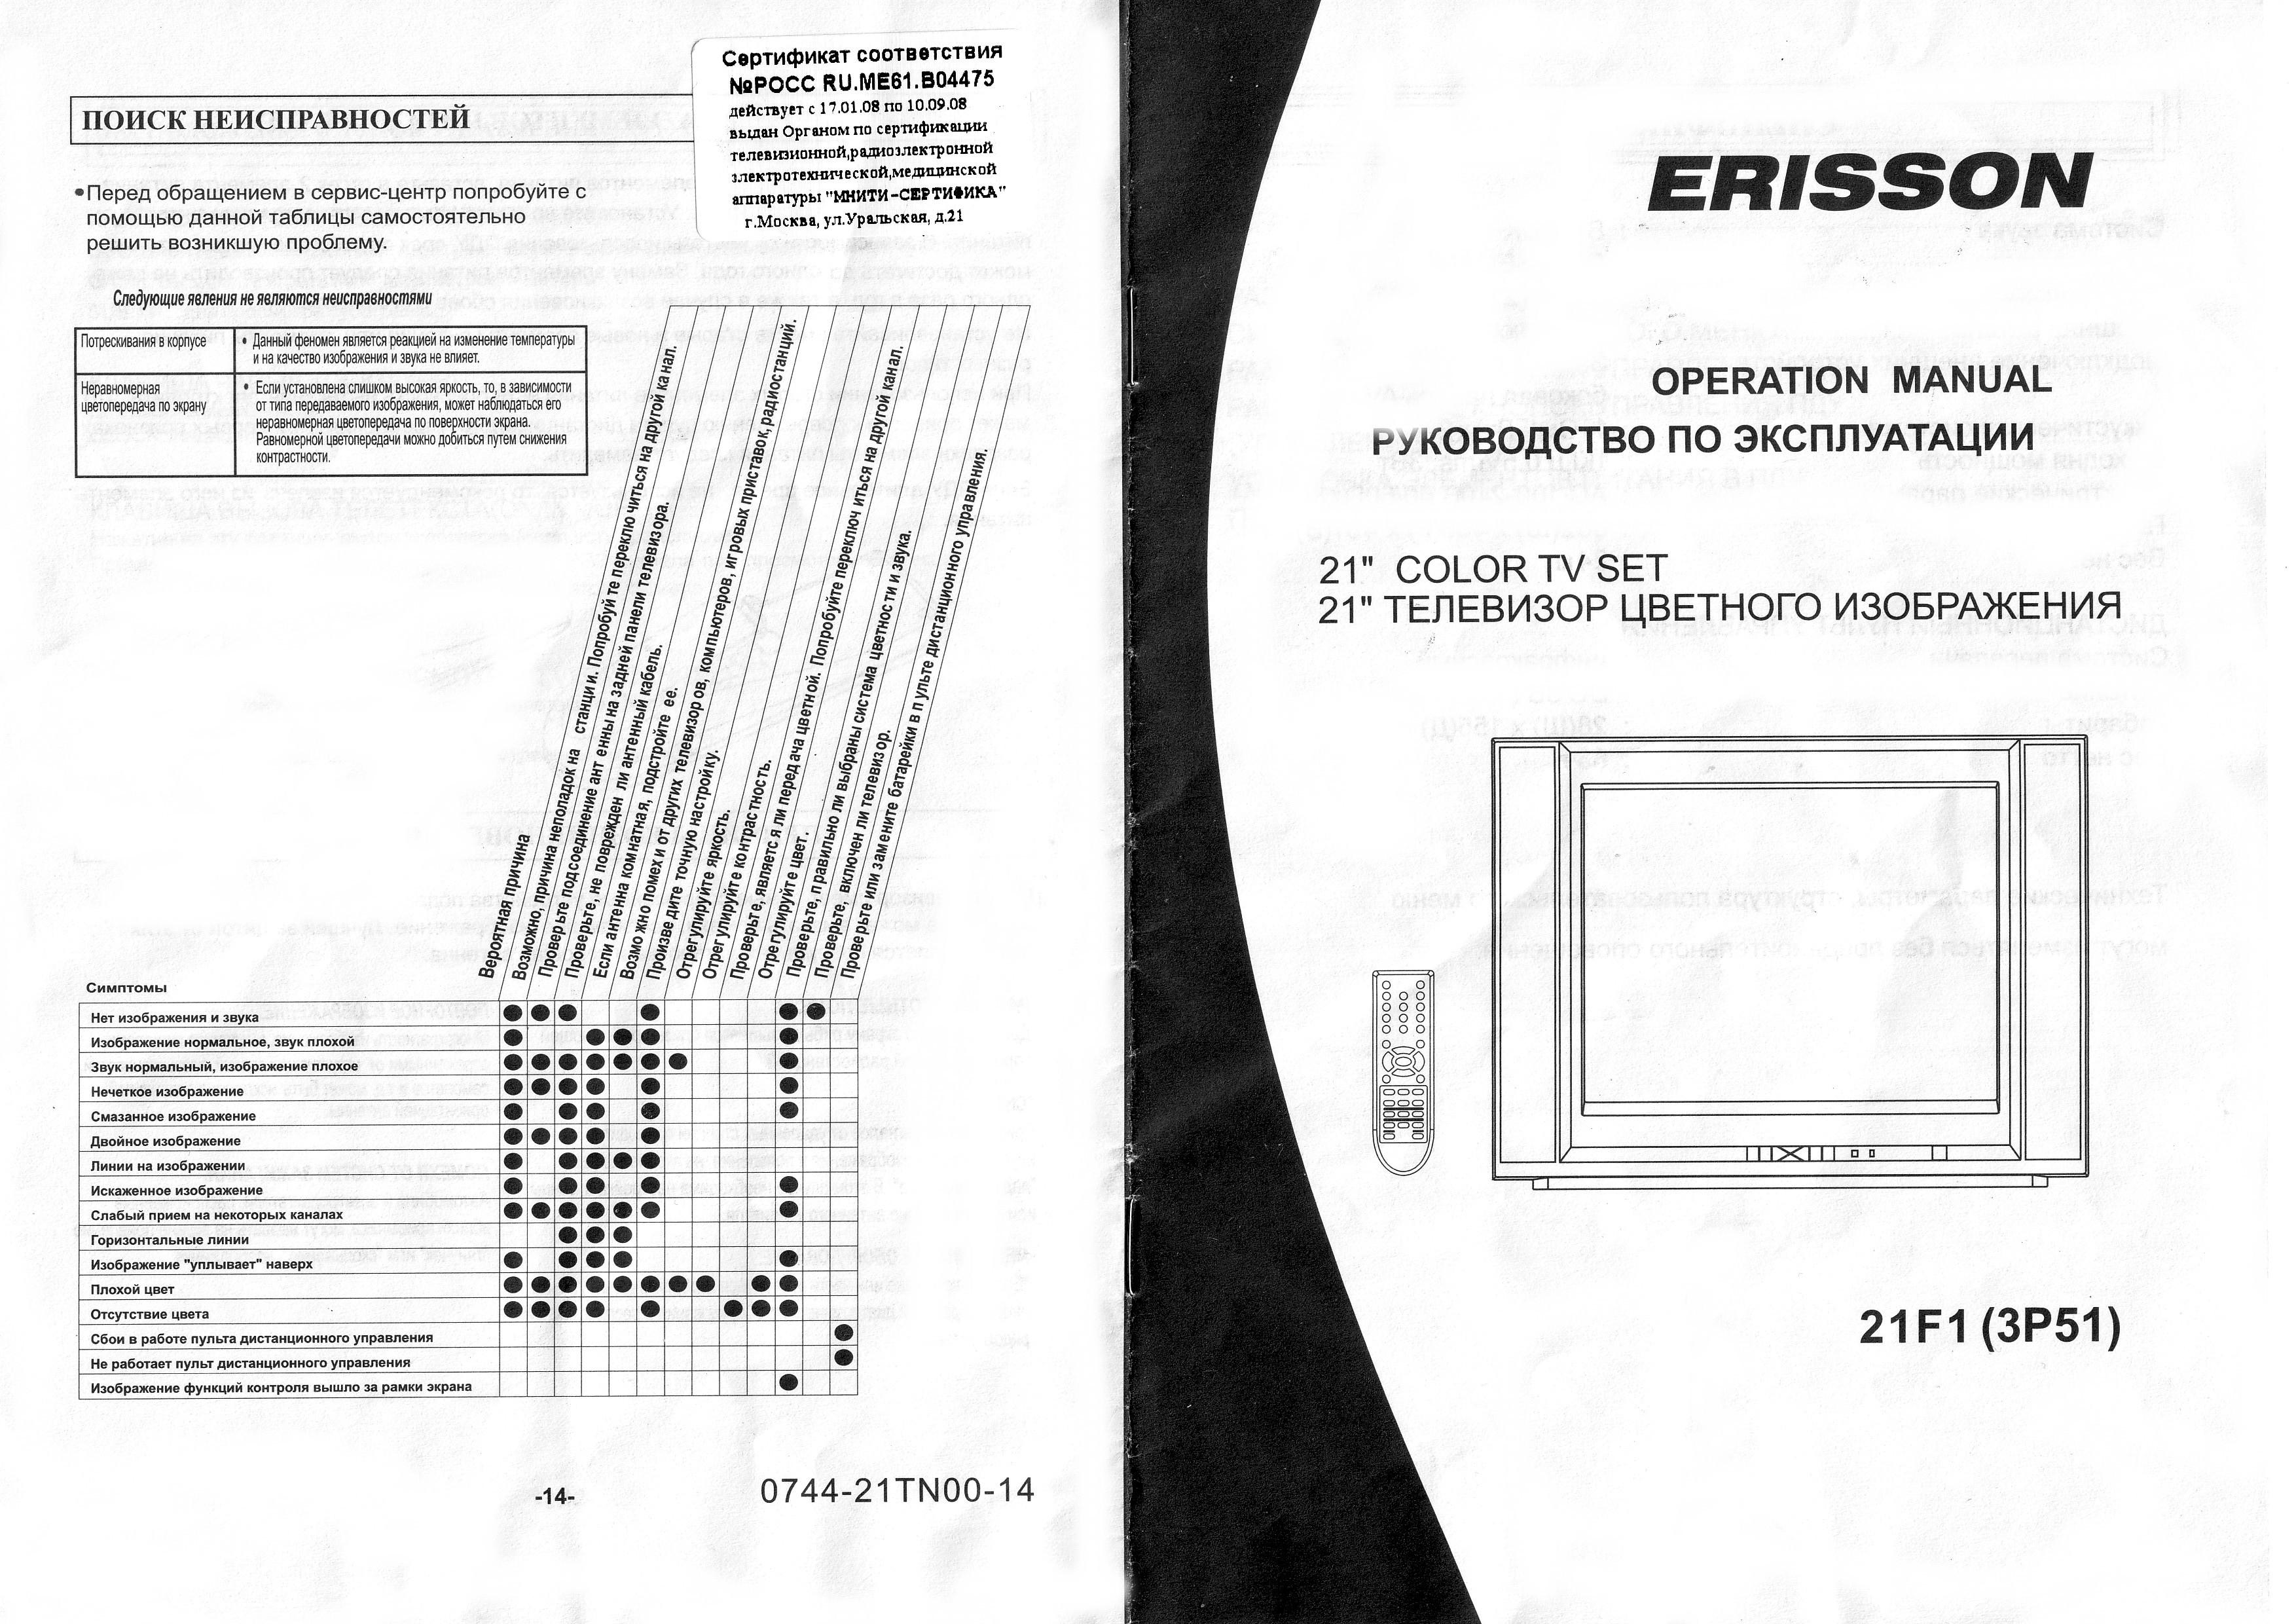 erisson 21f1(3p51) инструкция